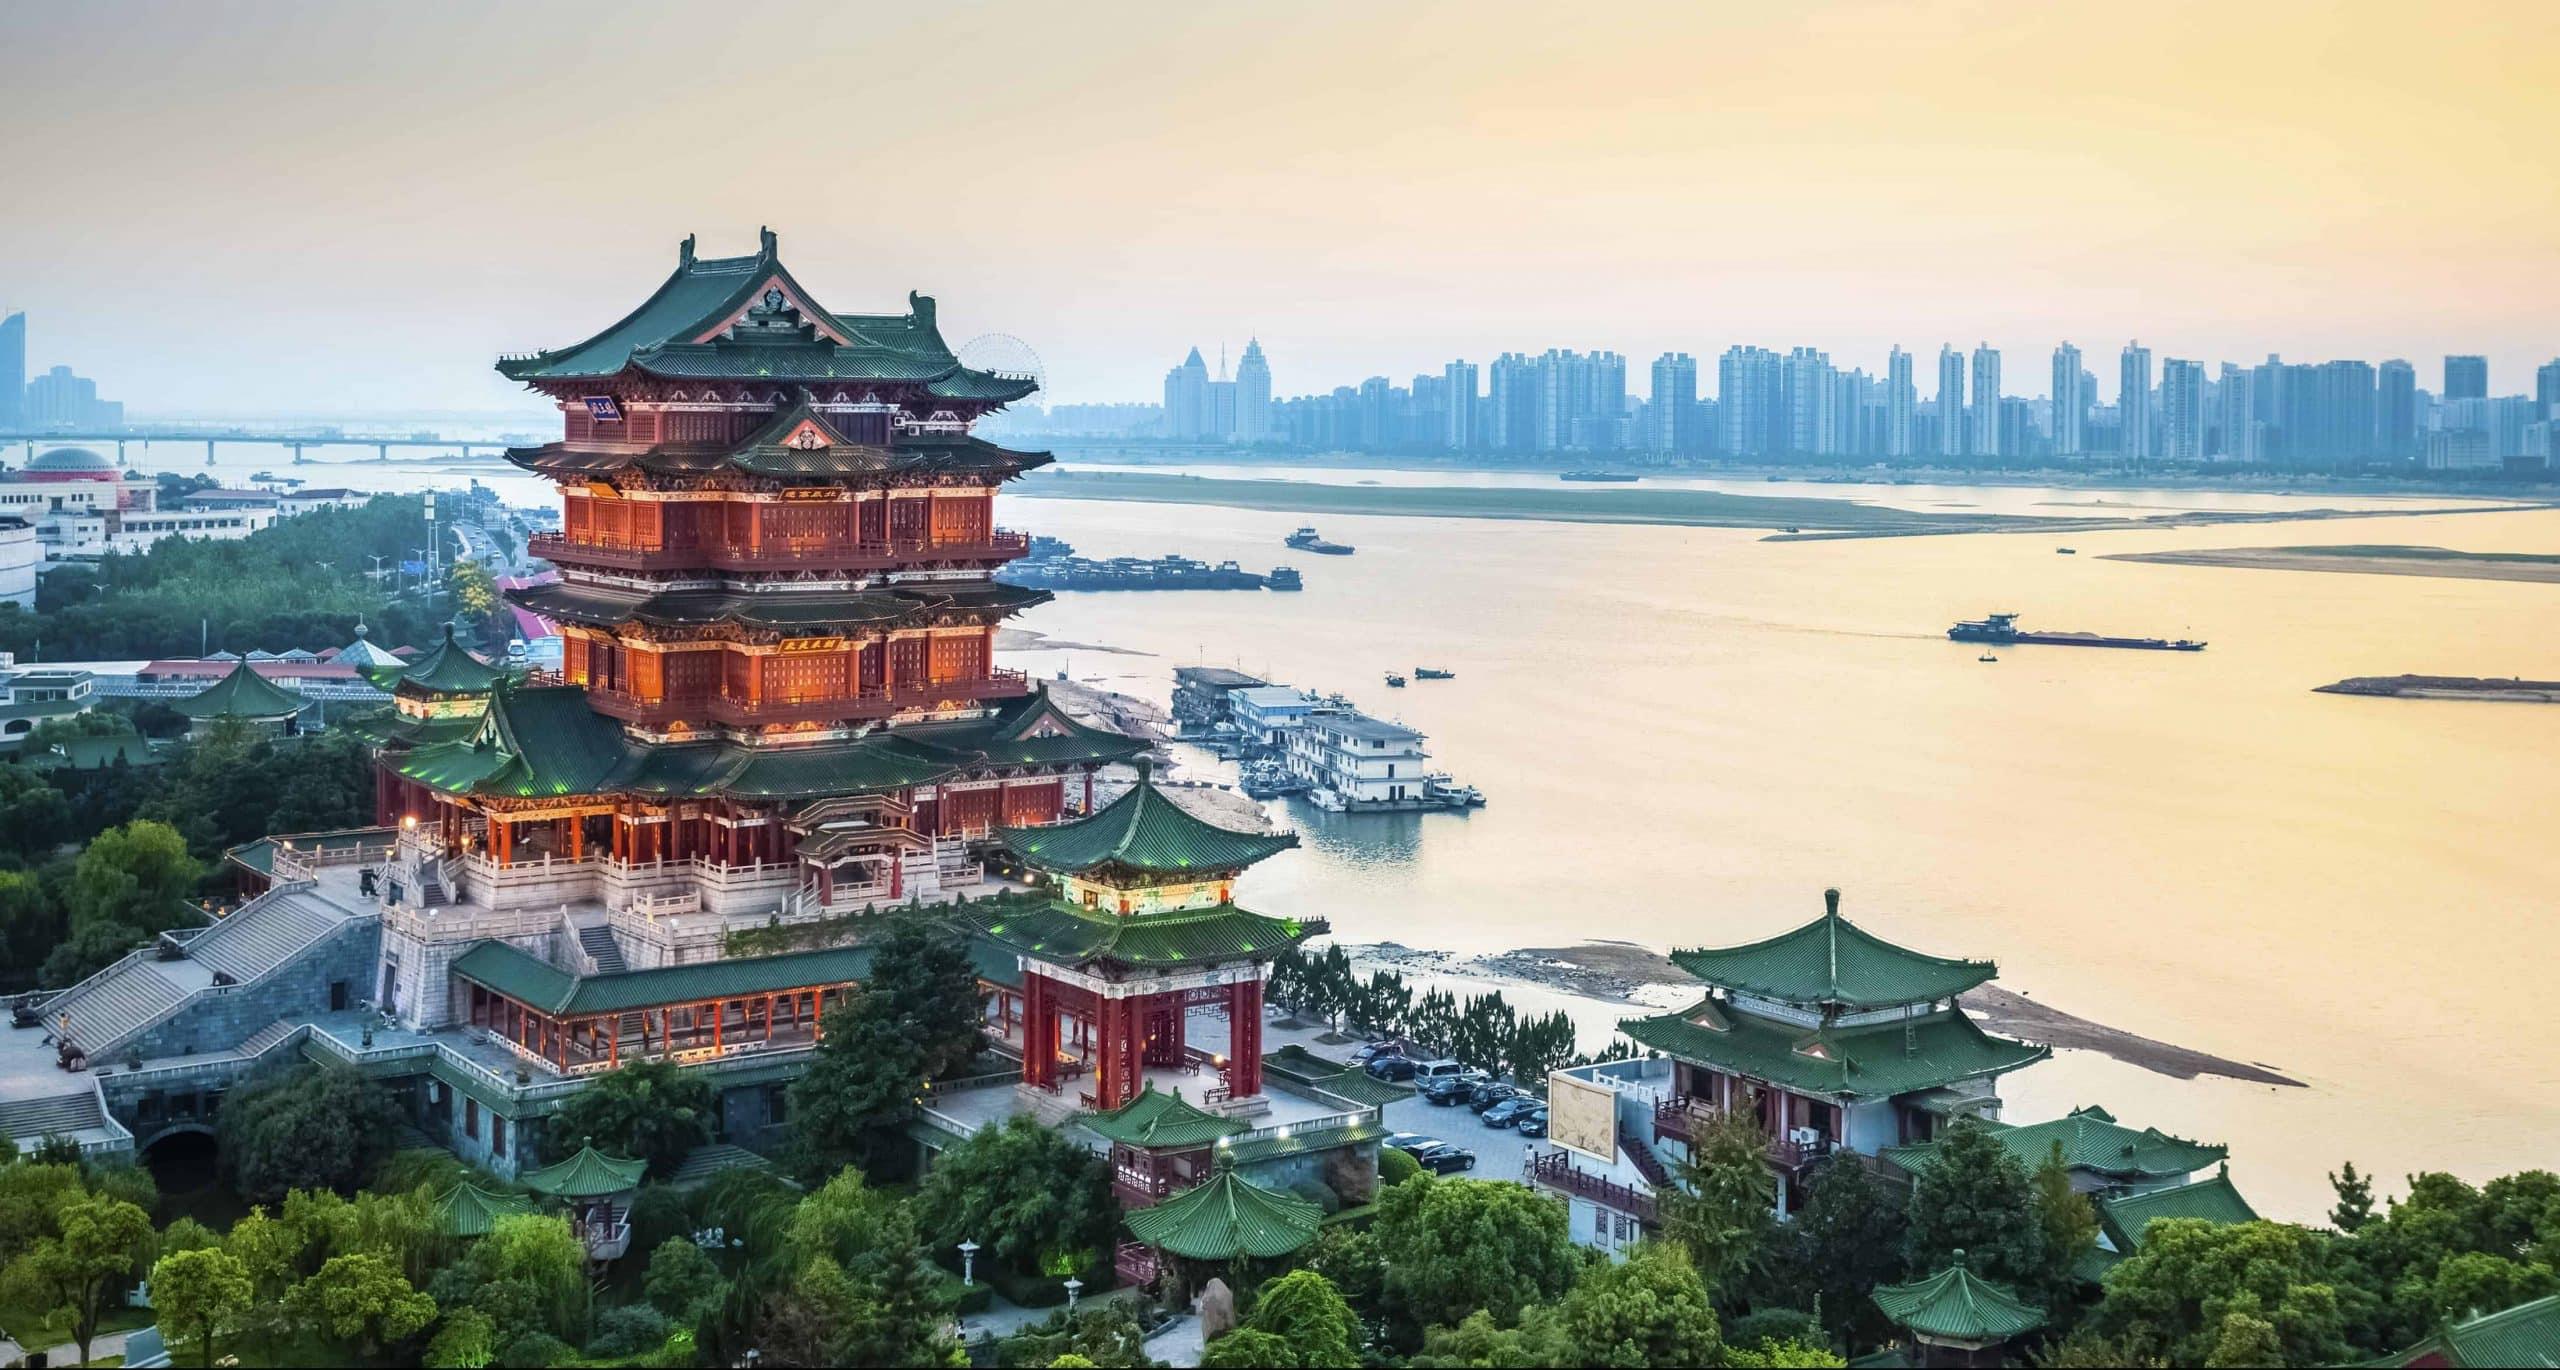 Nanchang Tengwang pavilion - Kina - Risskov Rejser